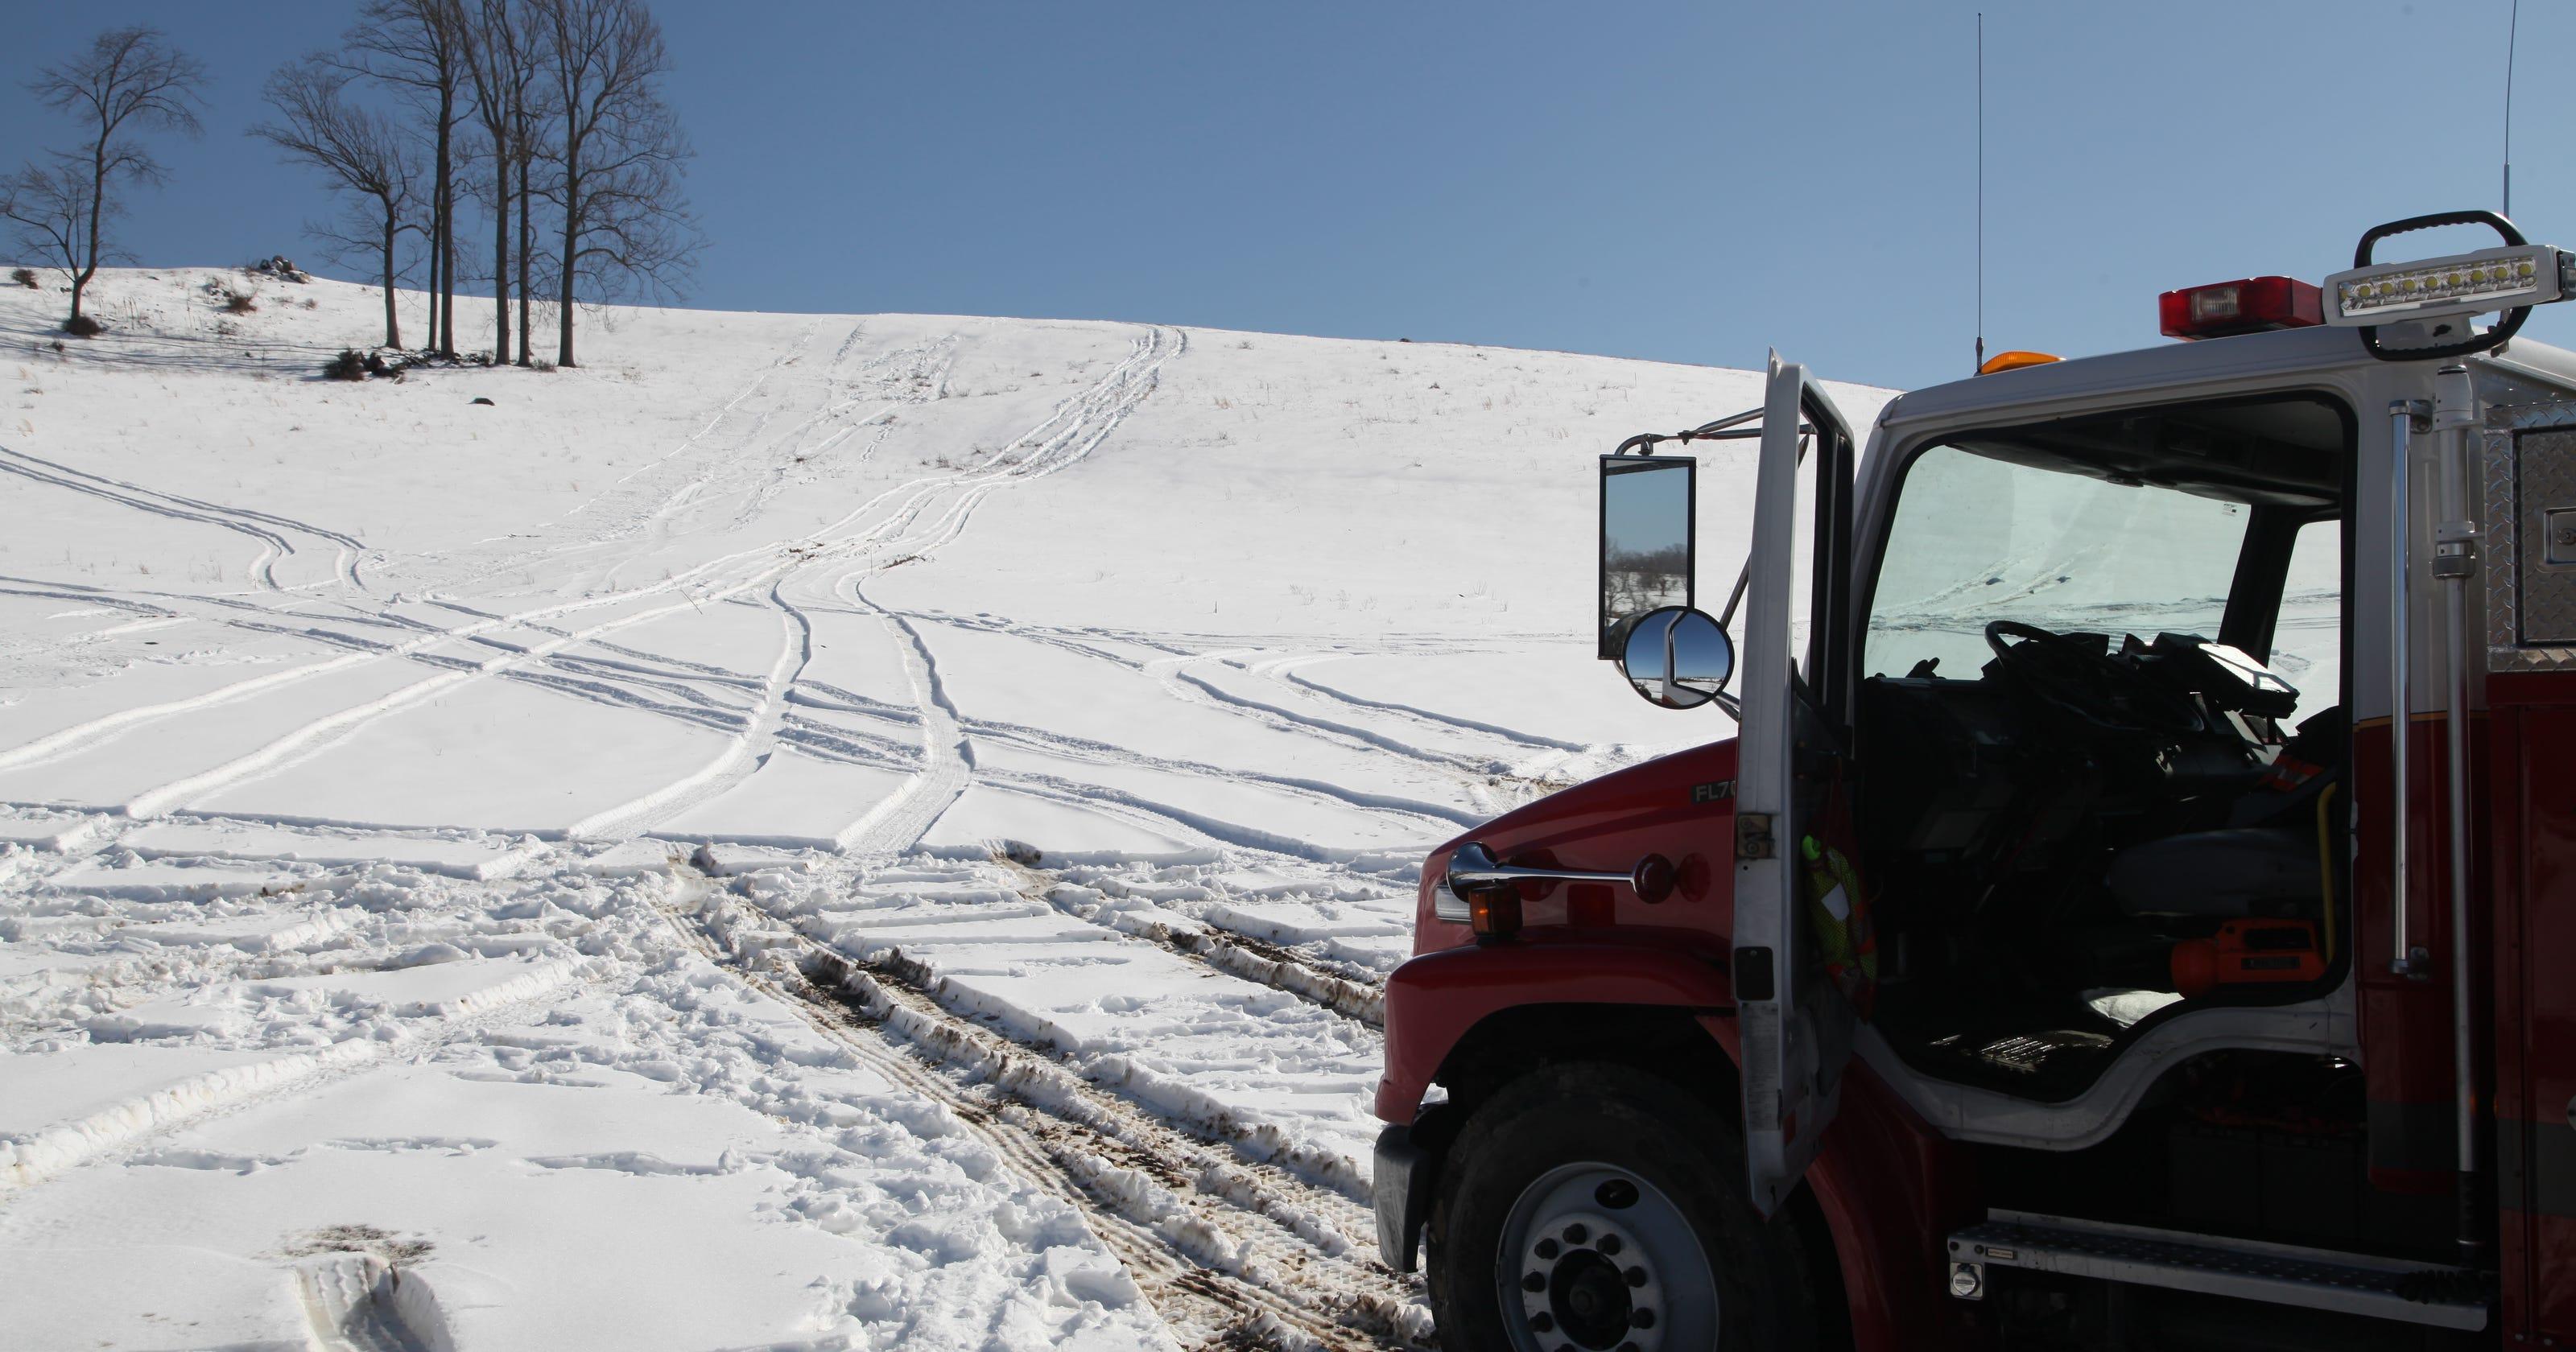 Six hospitalized after sledding accident